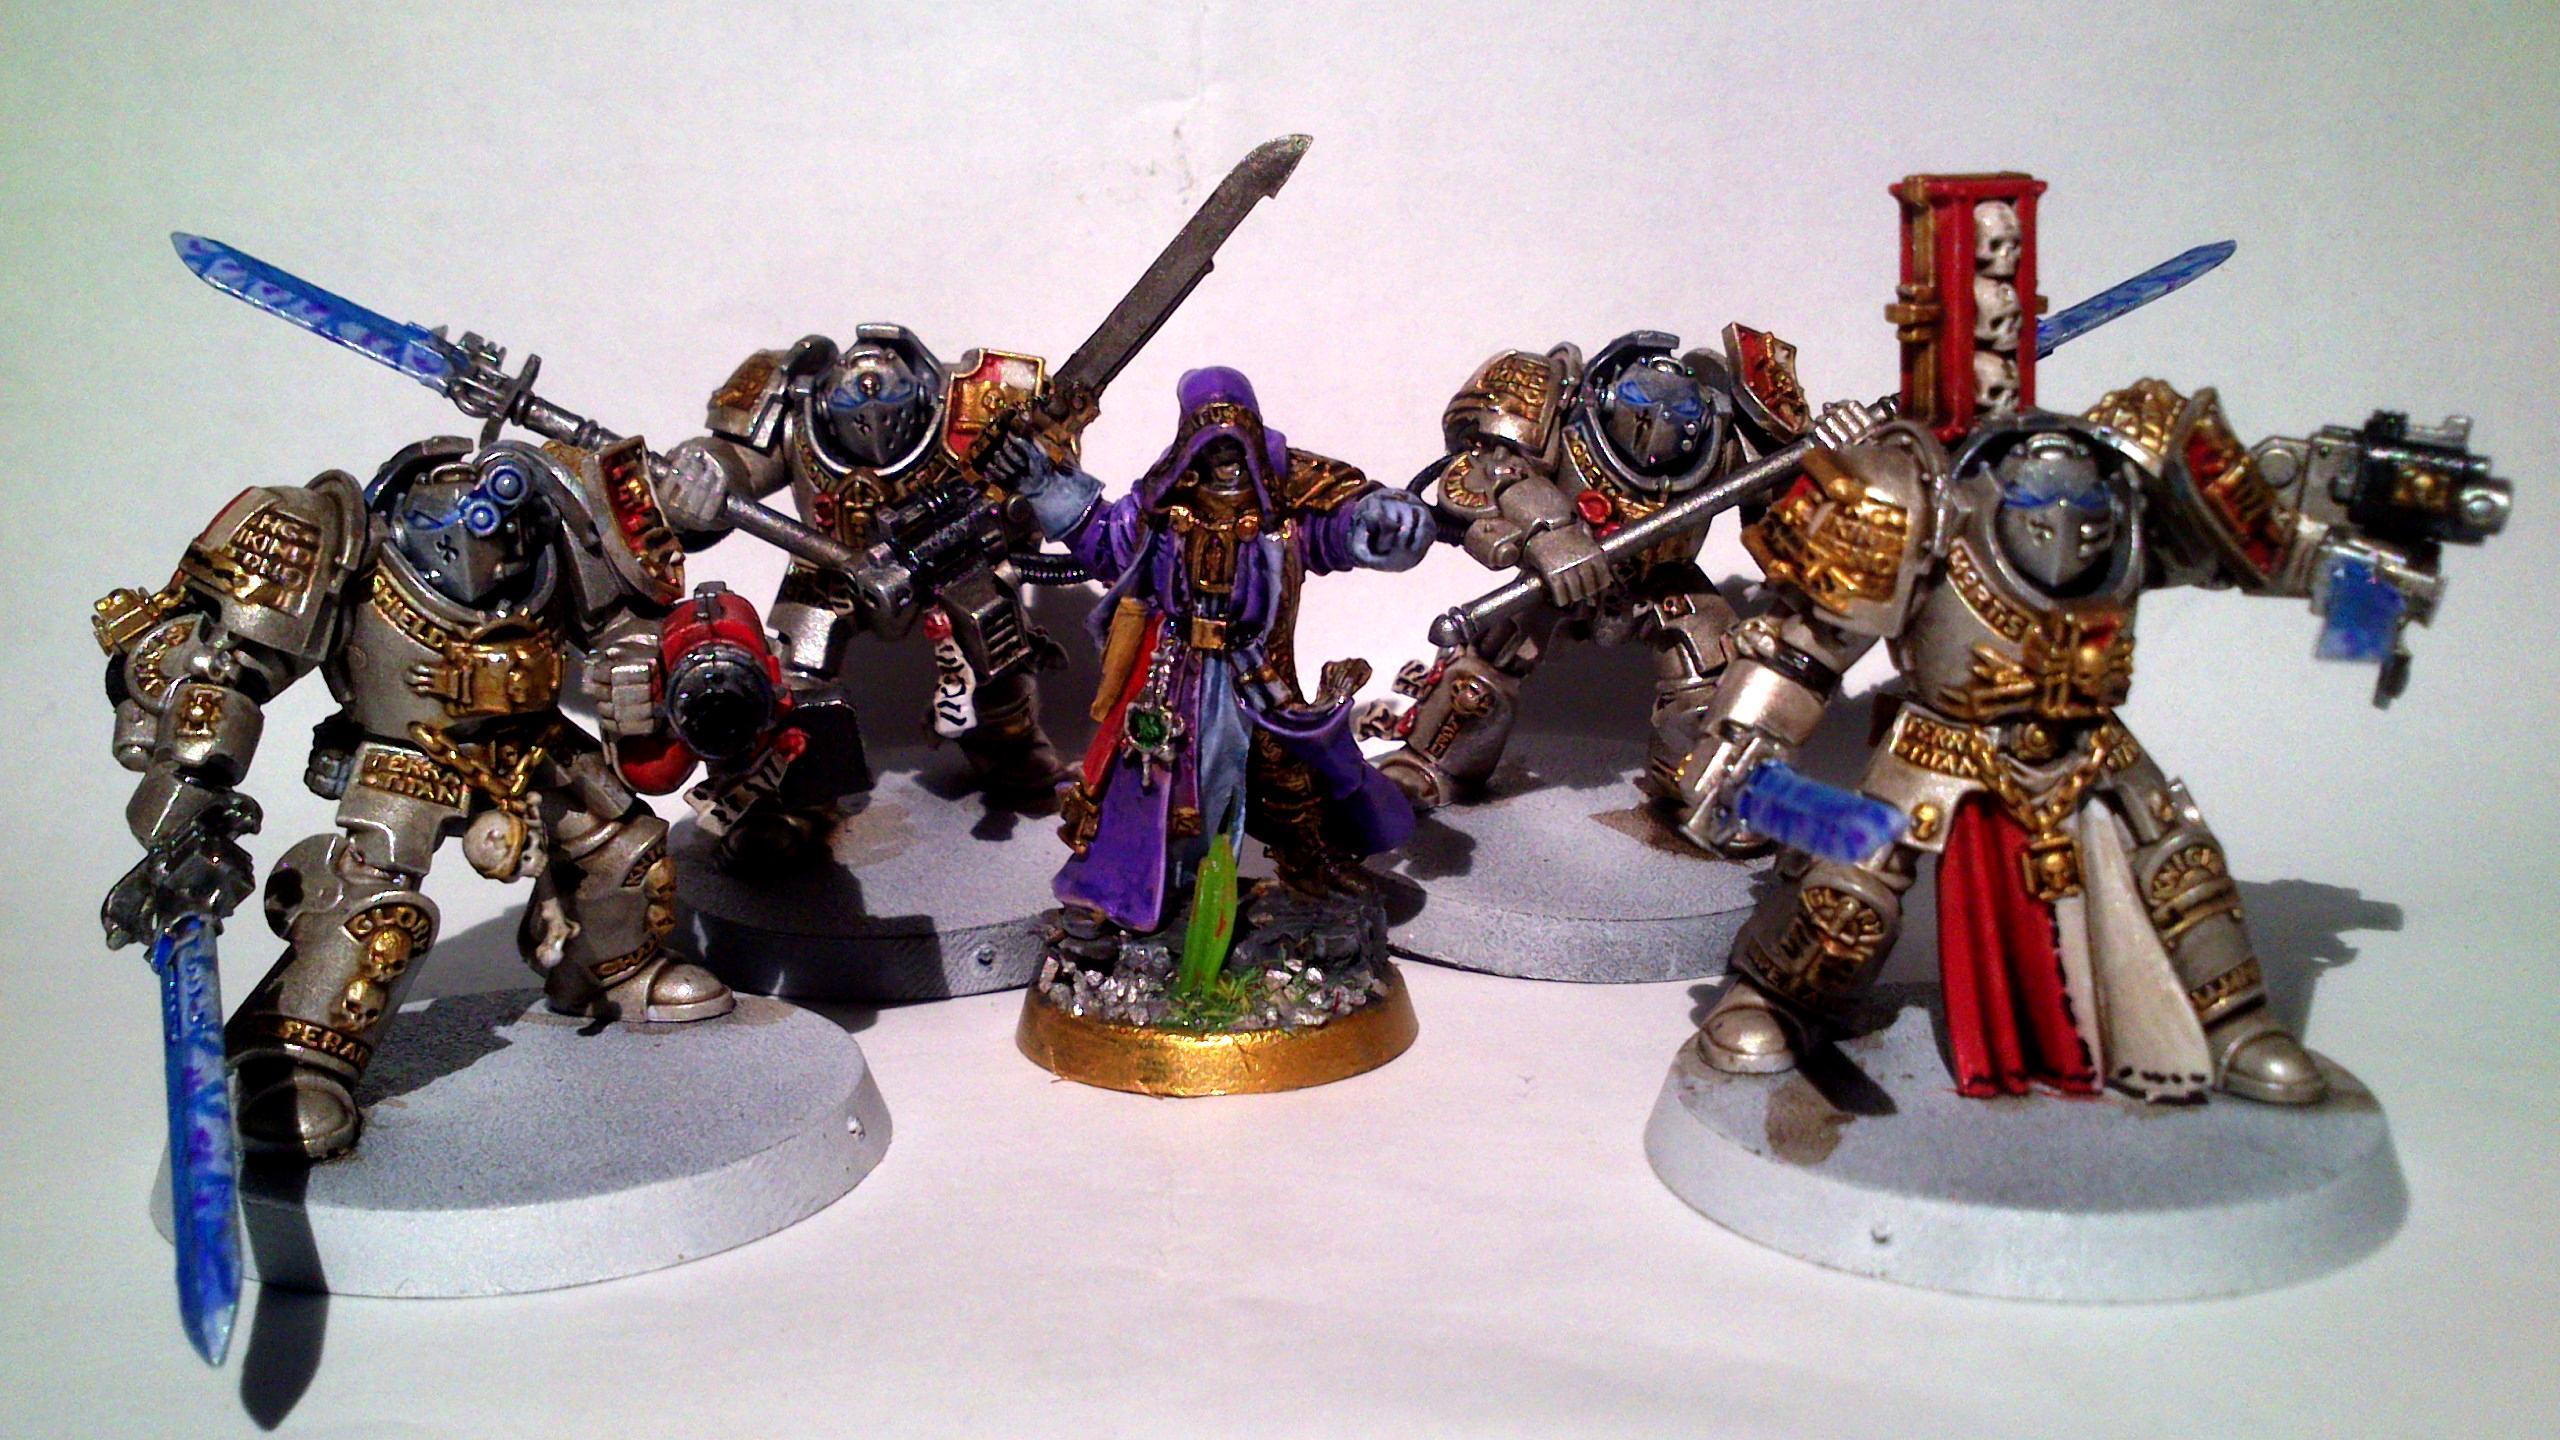 Damocles, Grey Knights, Inquisition, Inquisitor, Paladins, Rhino